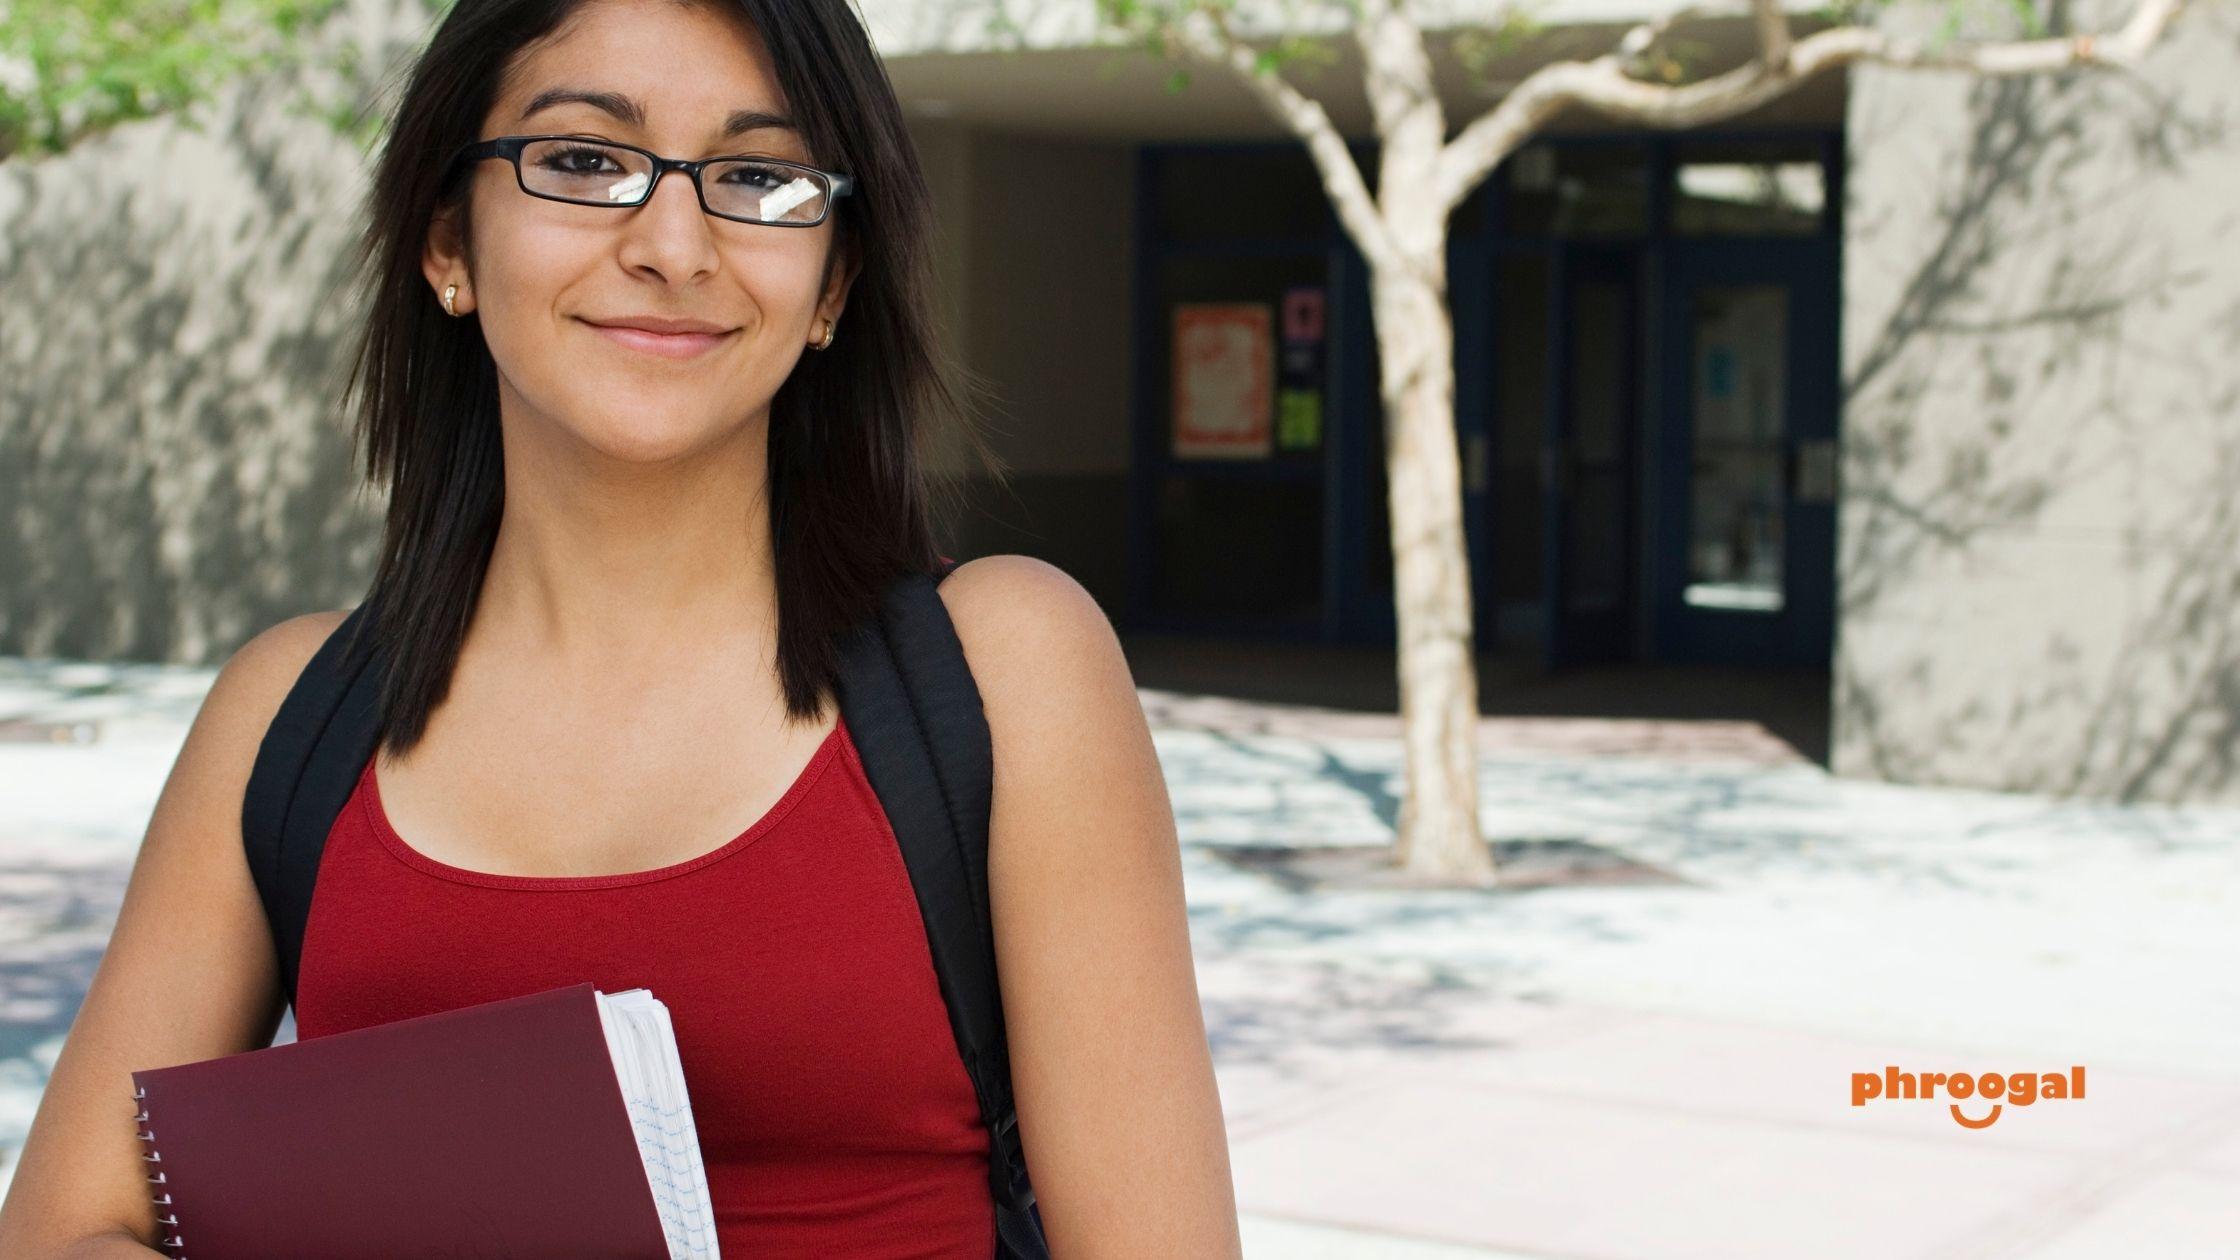 College Checklist 11th Graders in High School phroogal